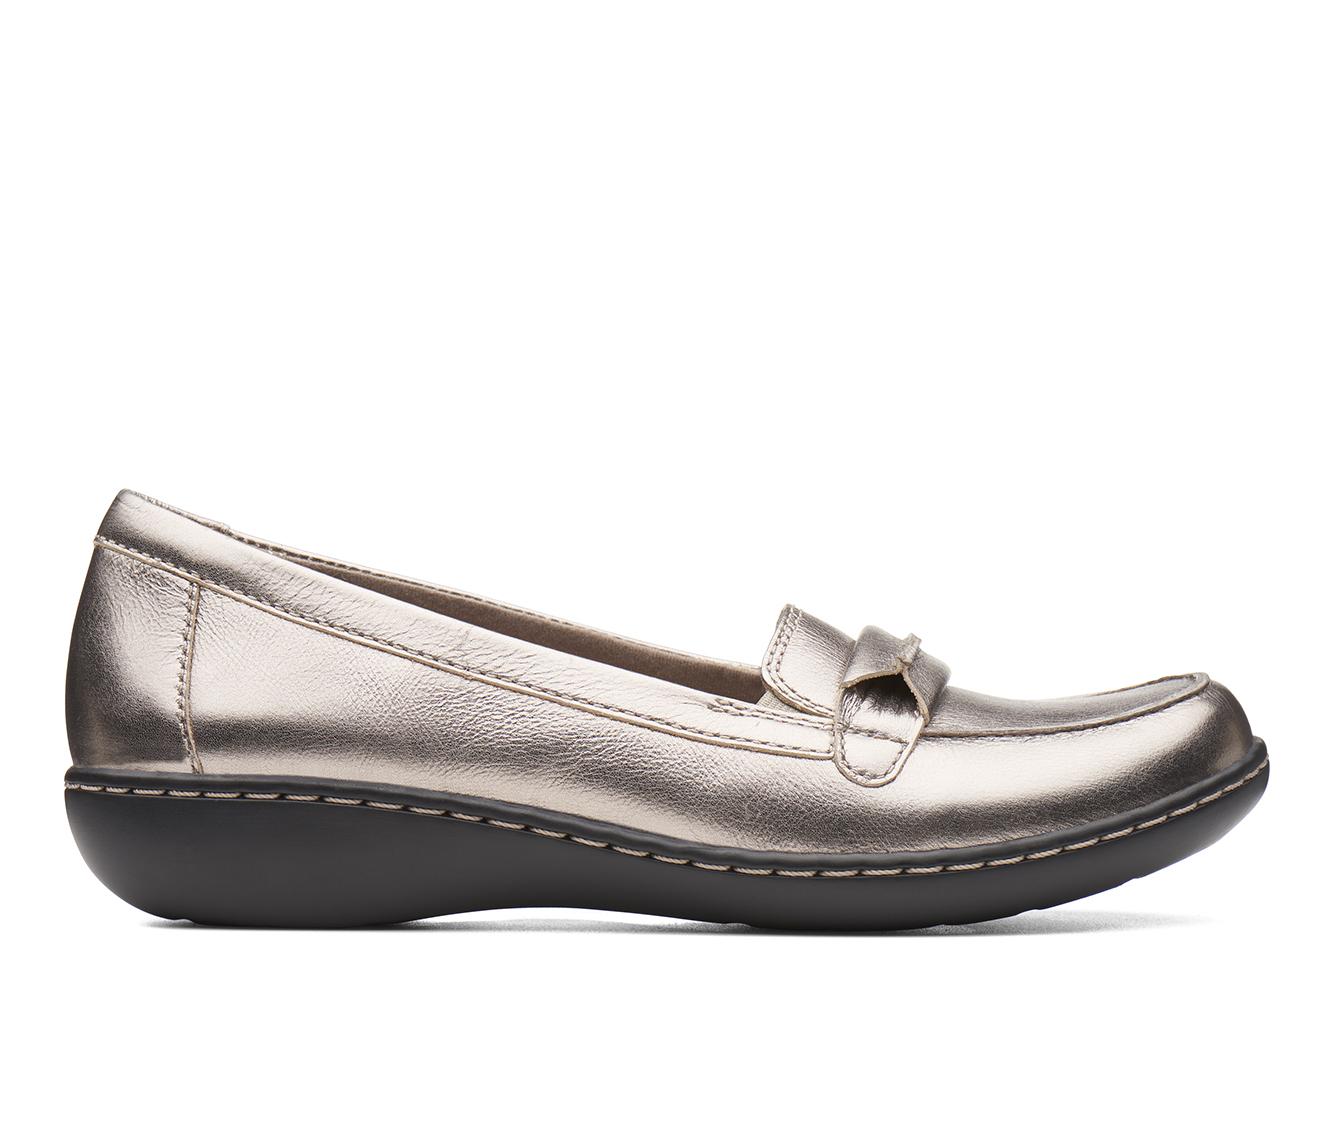 Clarks Ashland Lily Women's Shoe (Gray Leather)